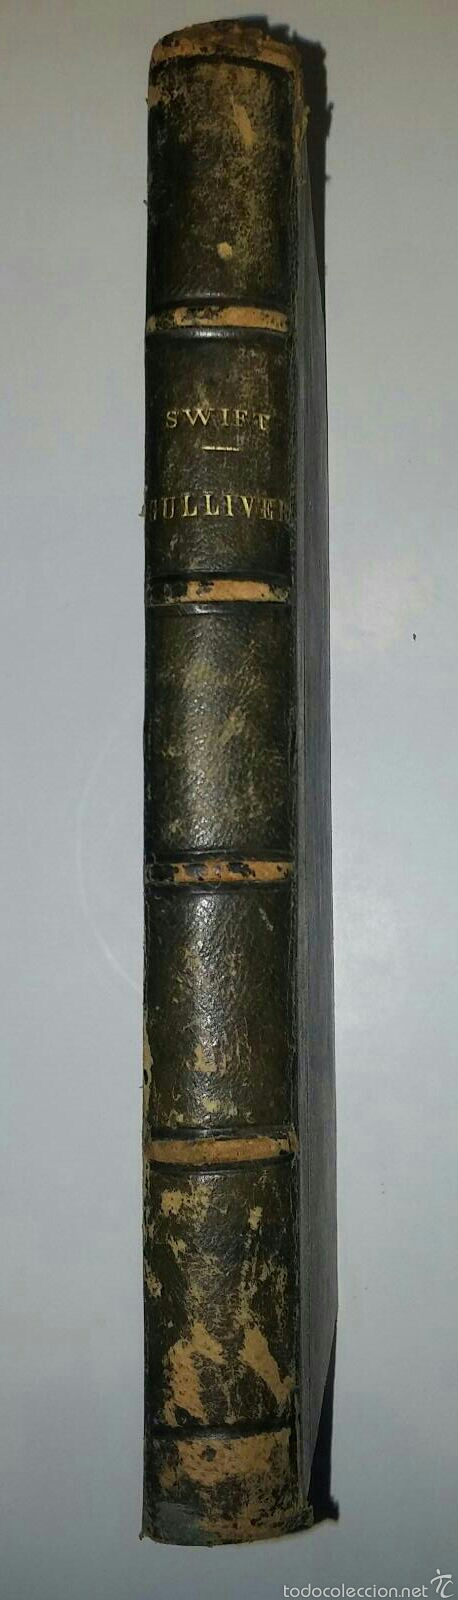 Libros antiguos: VIAJES DE GULLIVER - GIONATAN SWIFT - 1842 - MILAN - ITALIANO - 328 - Foto 6 - 54064776